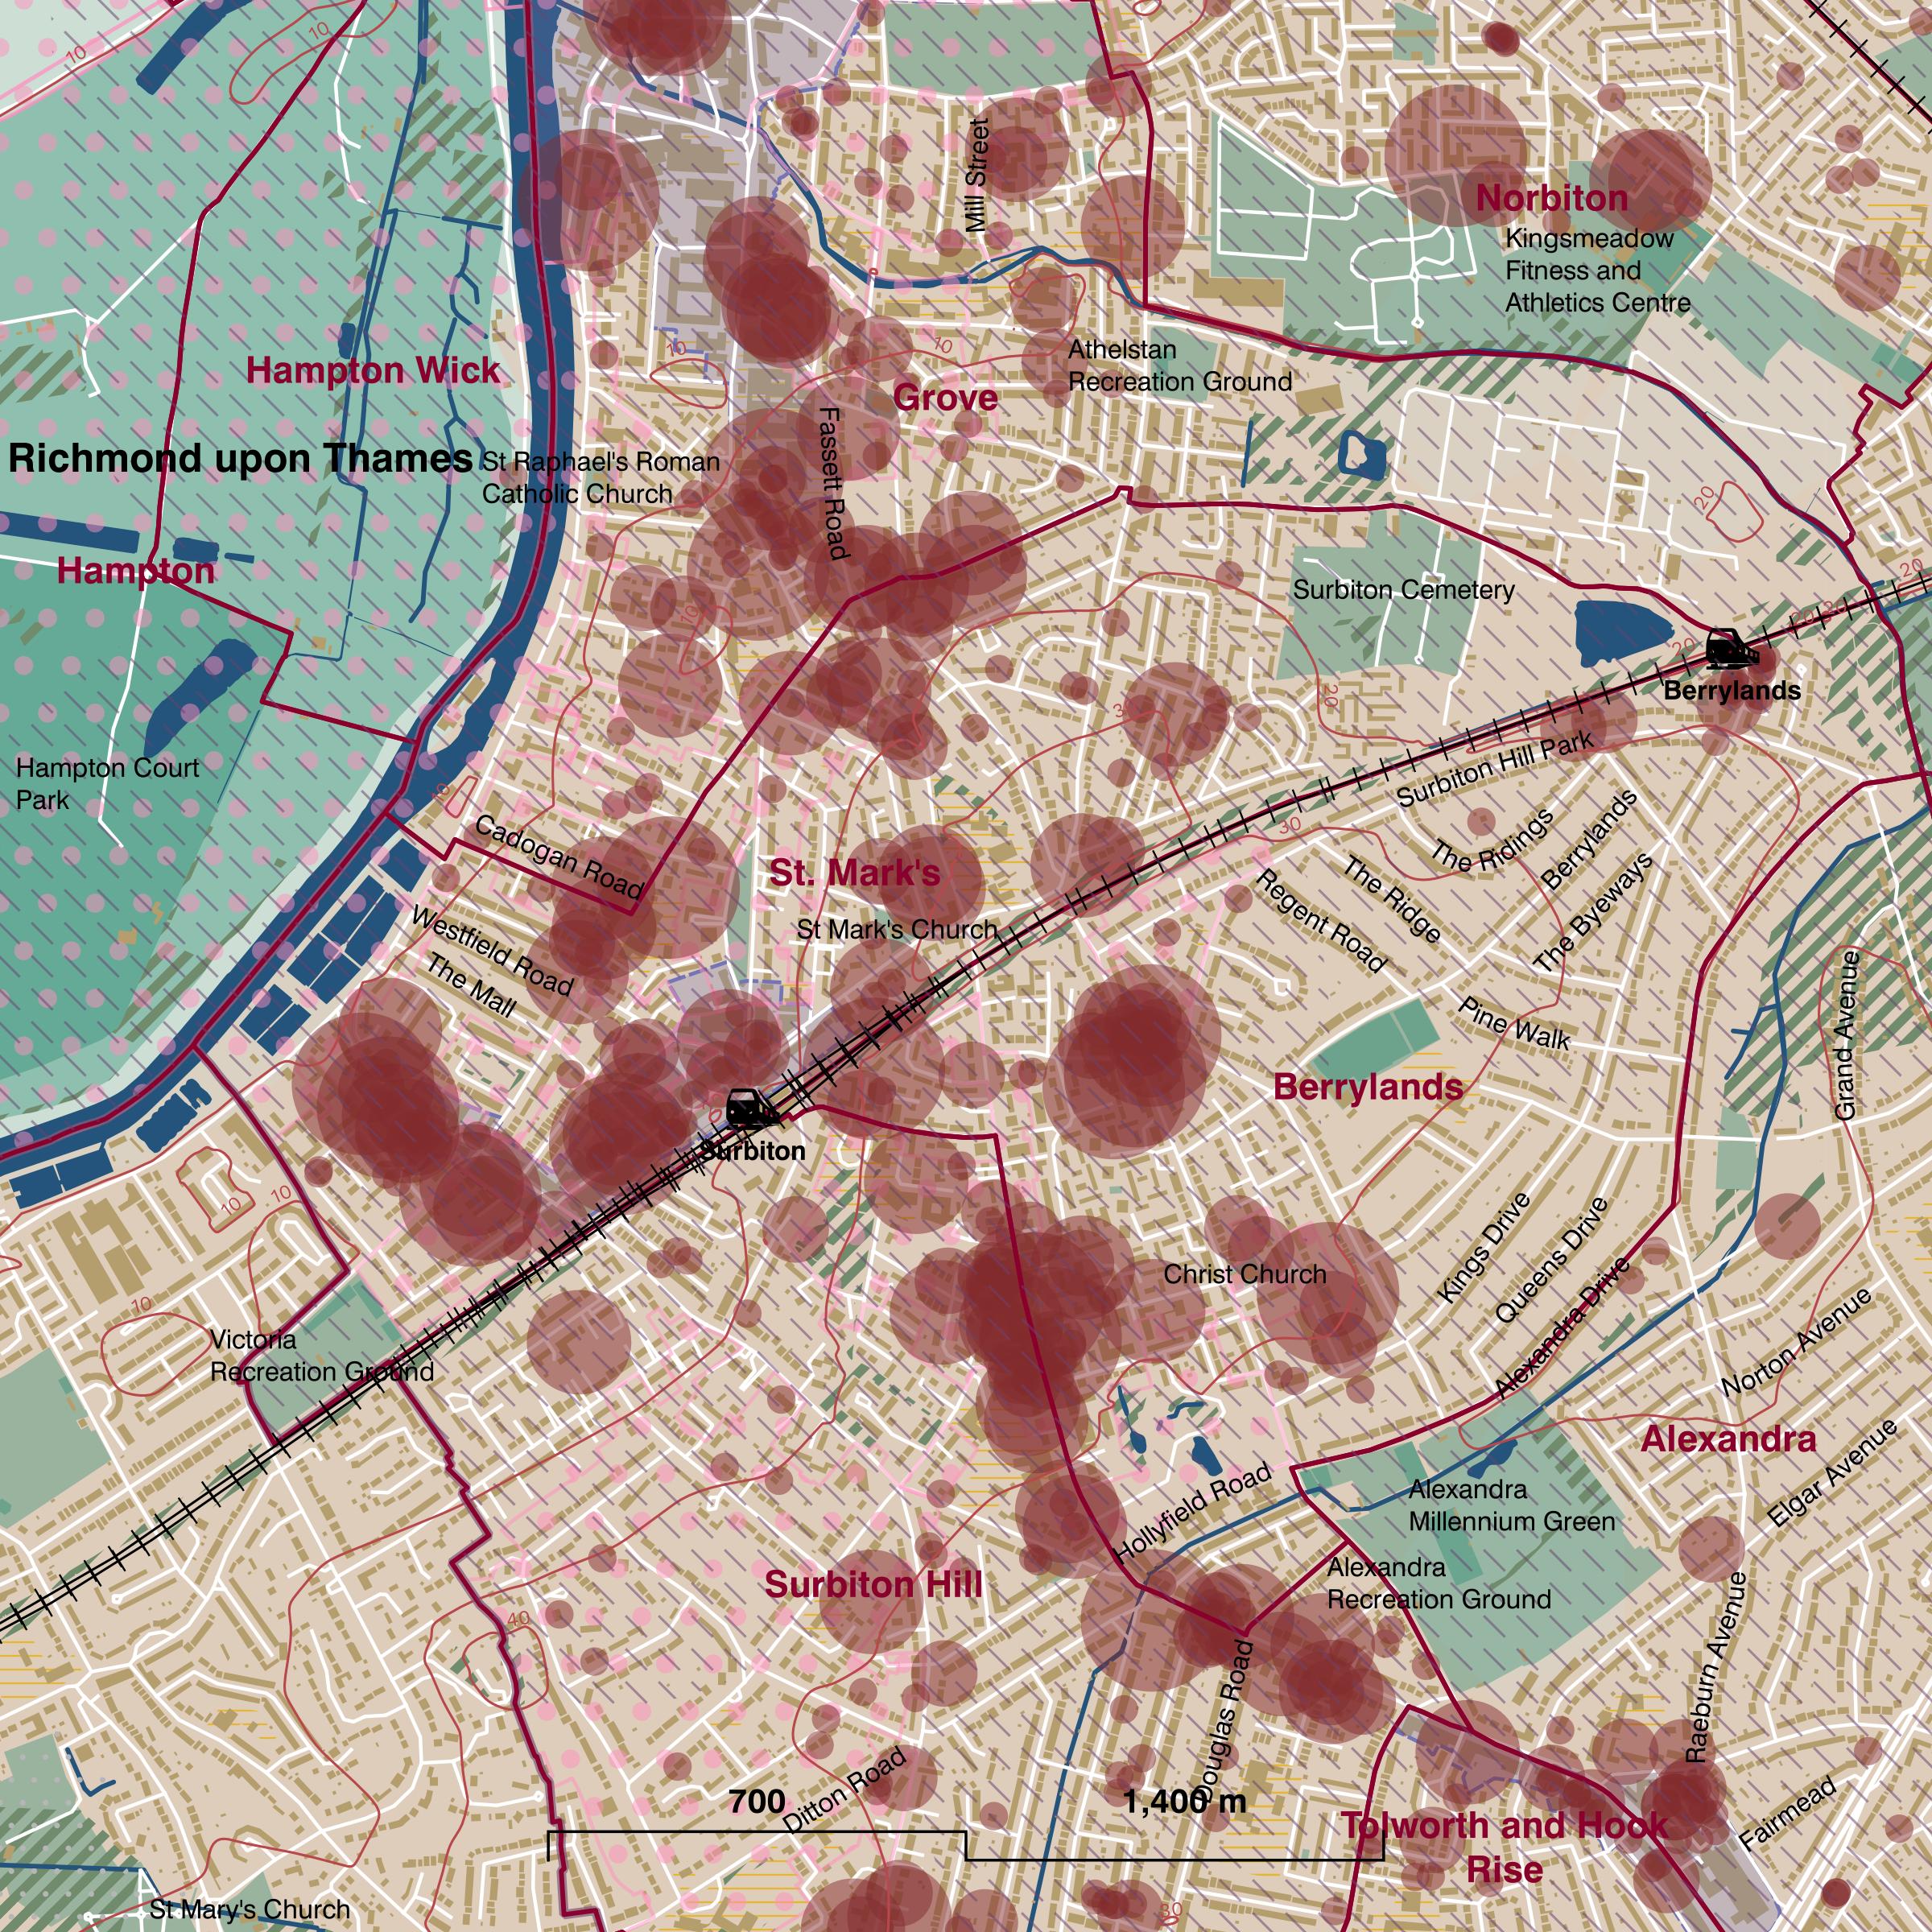 Map of St. Mark's ward